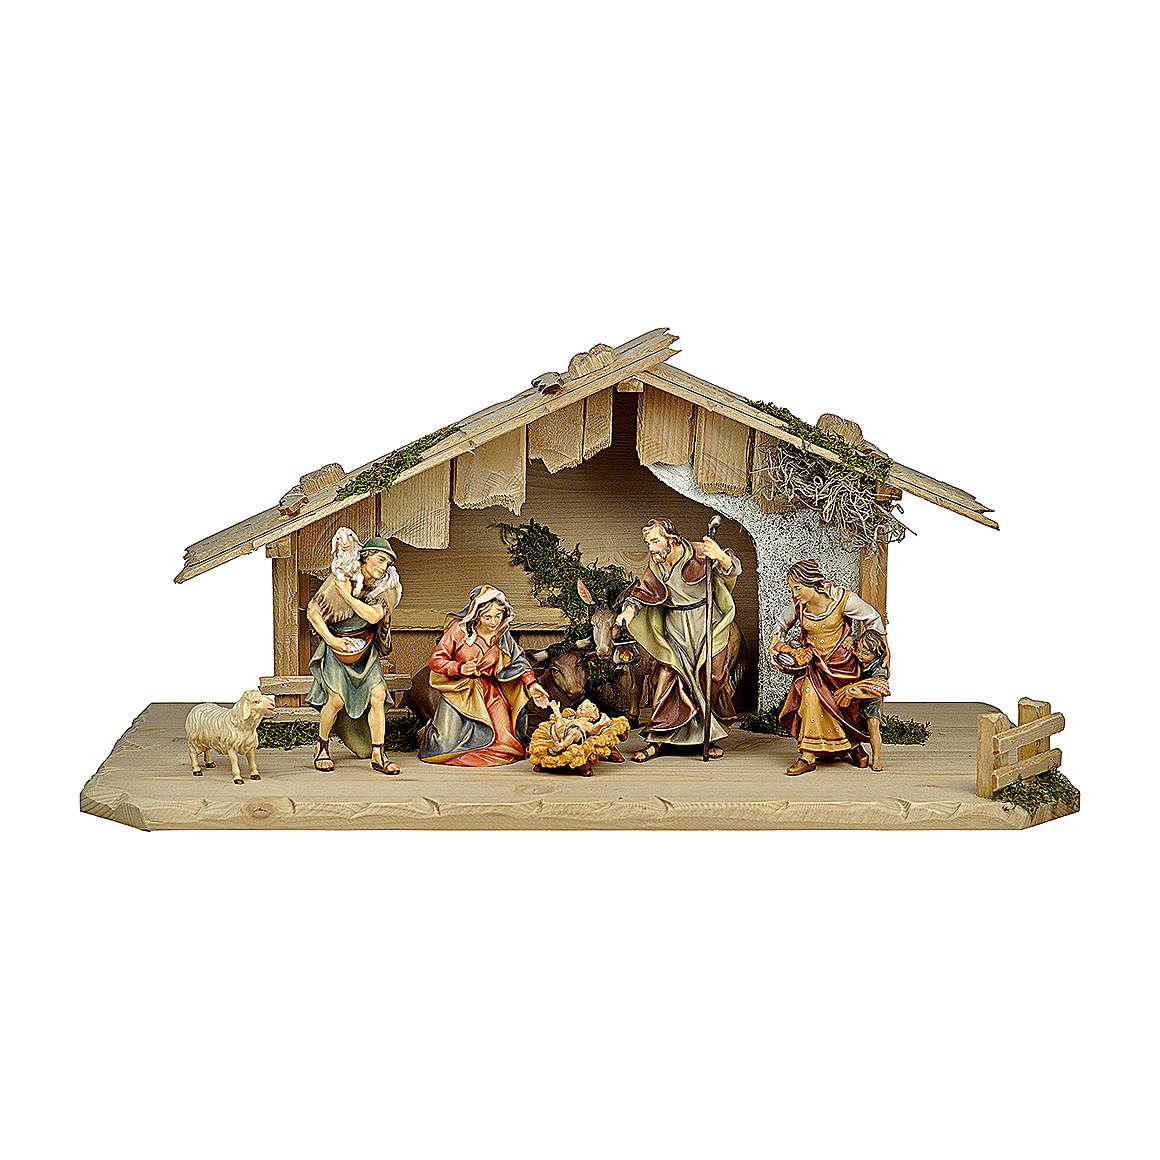 Presepe pastori, bue e asino mod. Original legno dipinto in Val Gardena 12 cm - 8 pz 4